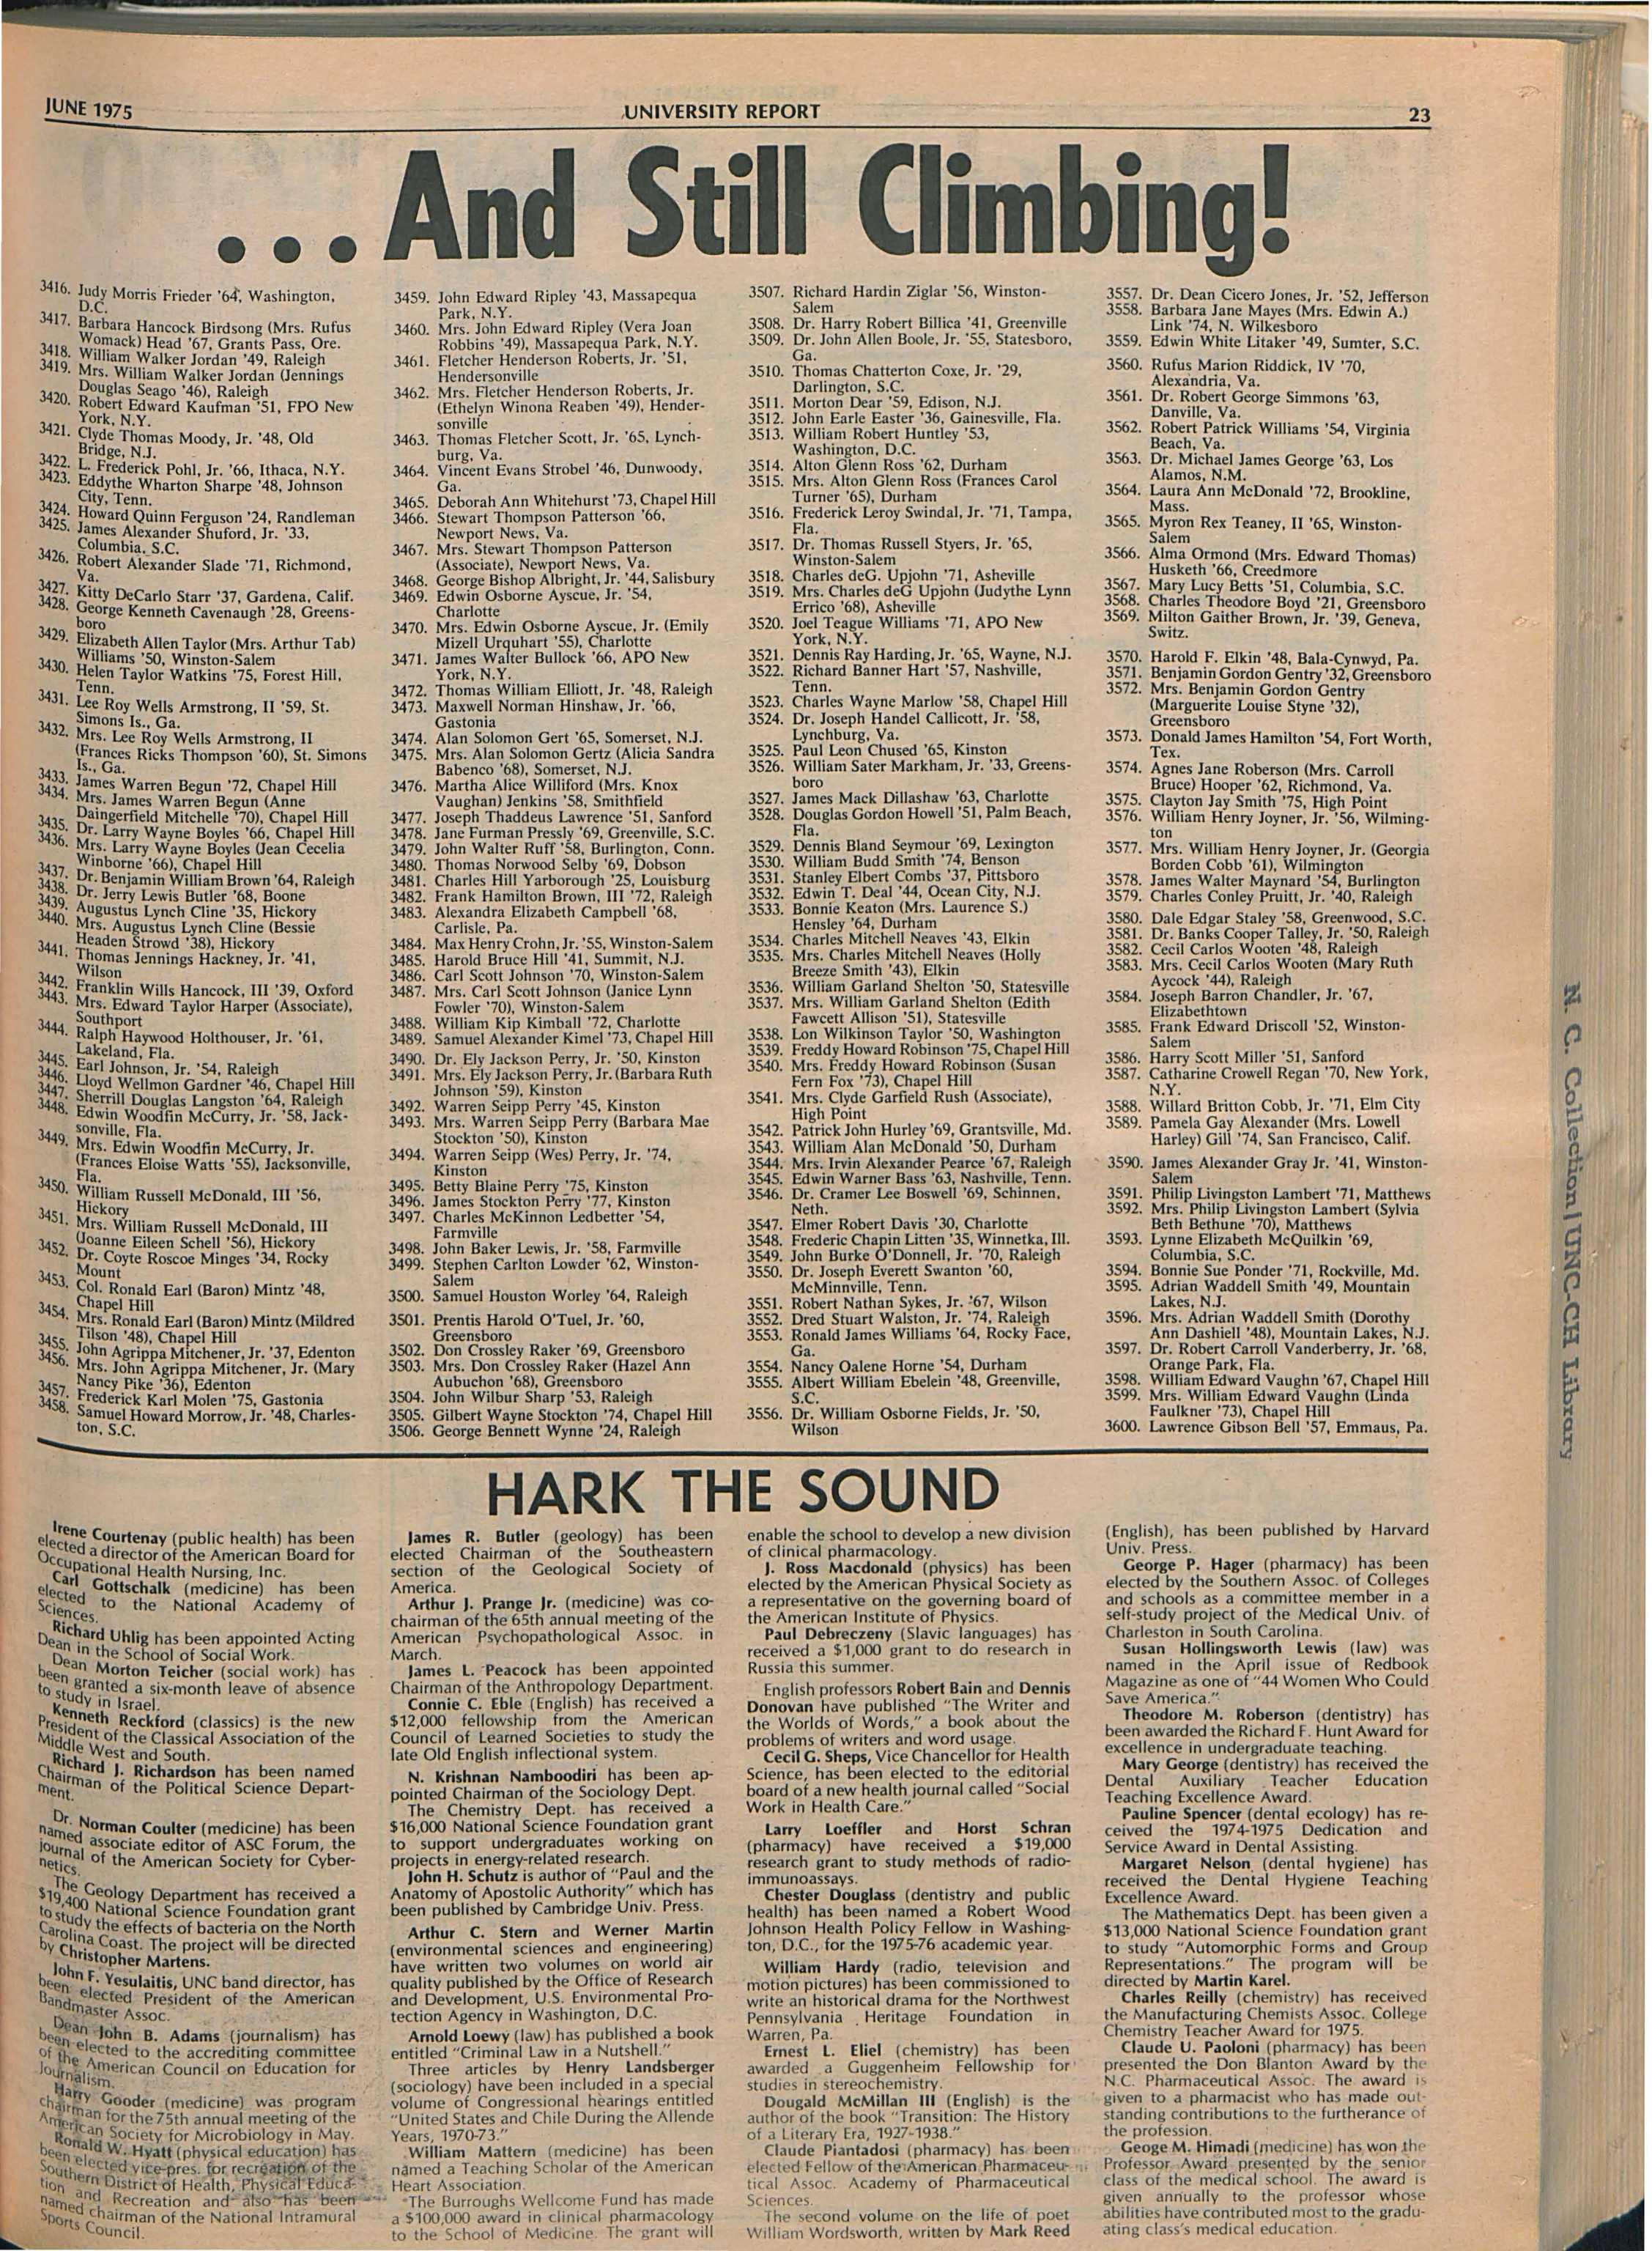 Forum on this topic: Bernard Lee (1908?981), rosemarie-gil-b-1942/